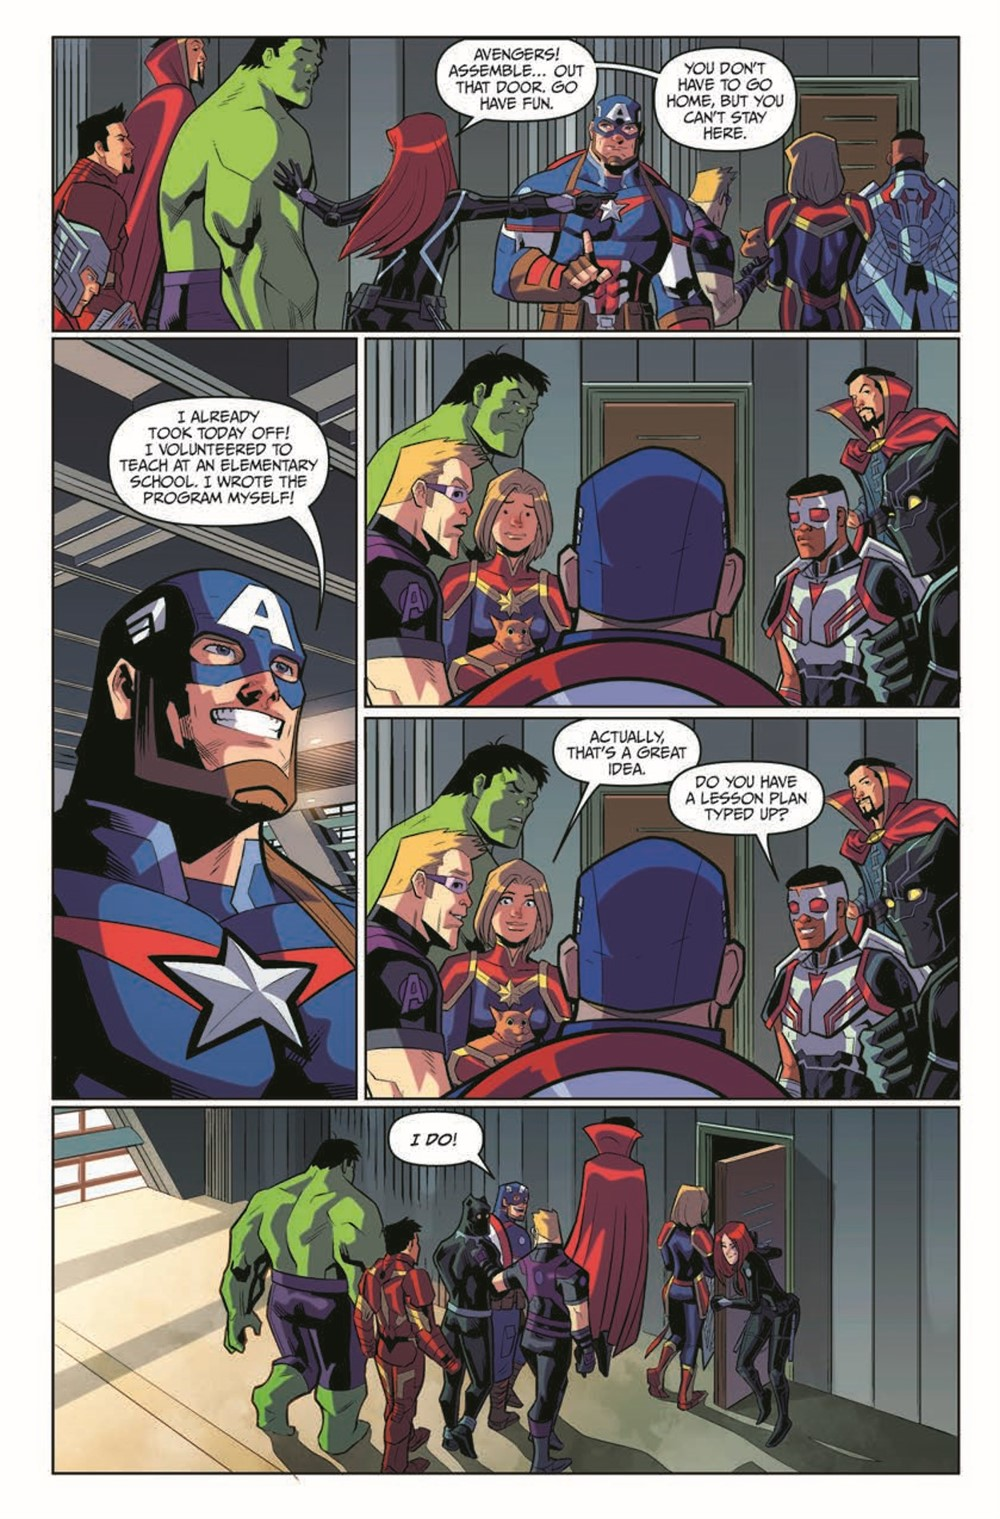 MarvelAction_Avengers_Vol.1_OffTheClock_TPB_pr-6 ComicList Previews: MARVEL ACTION AVENGERS VOLUME 5 OFF THE CLOCK TP